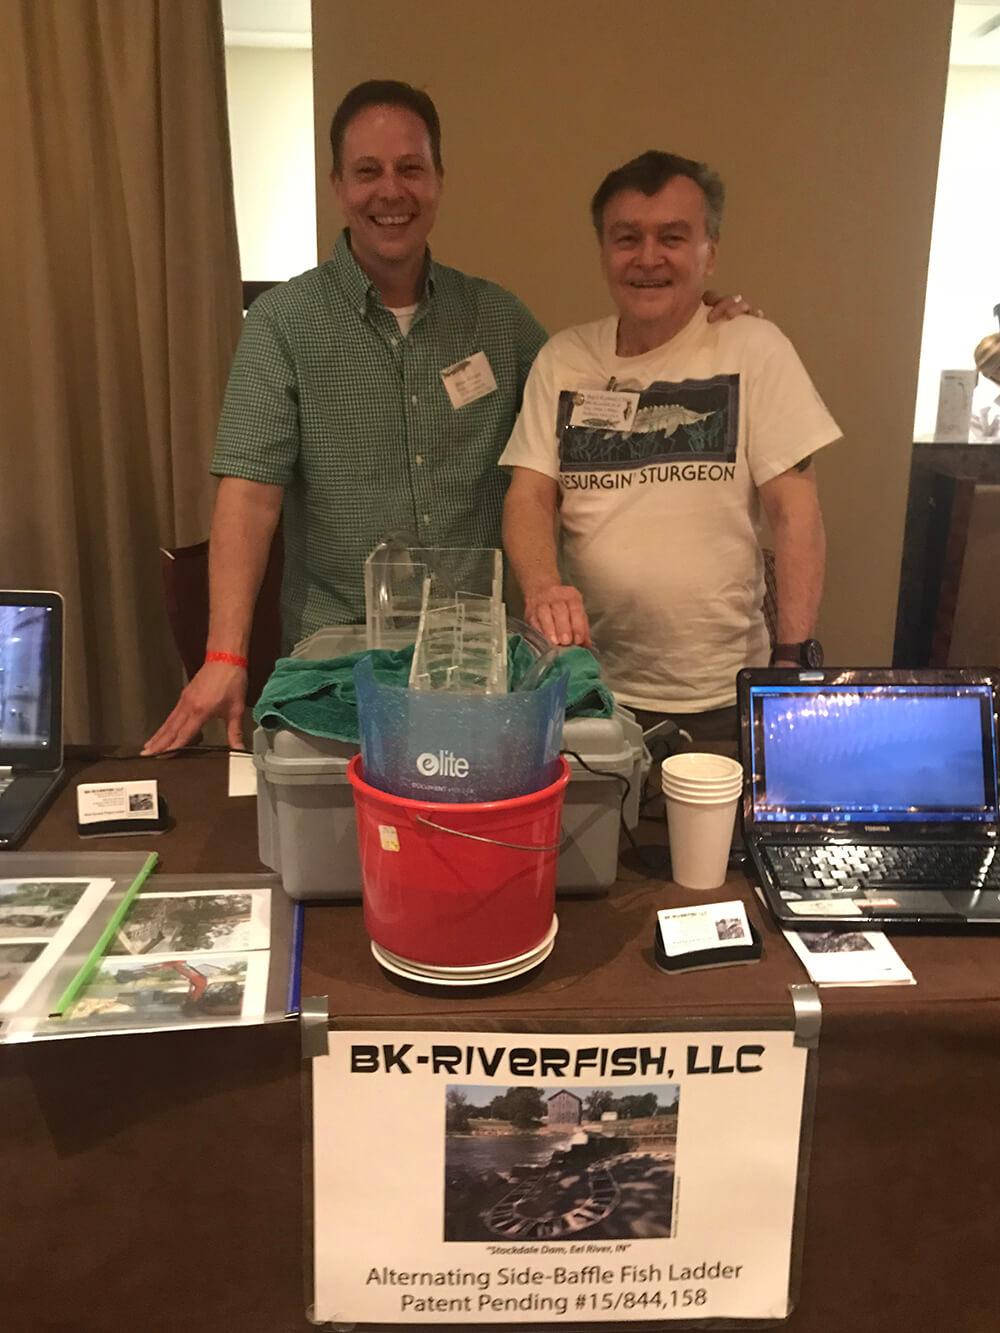 BK Riverfish, LLC.